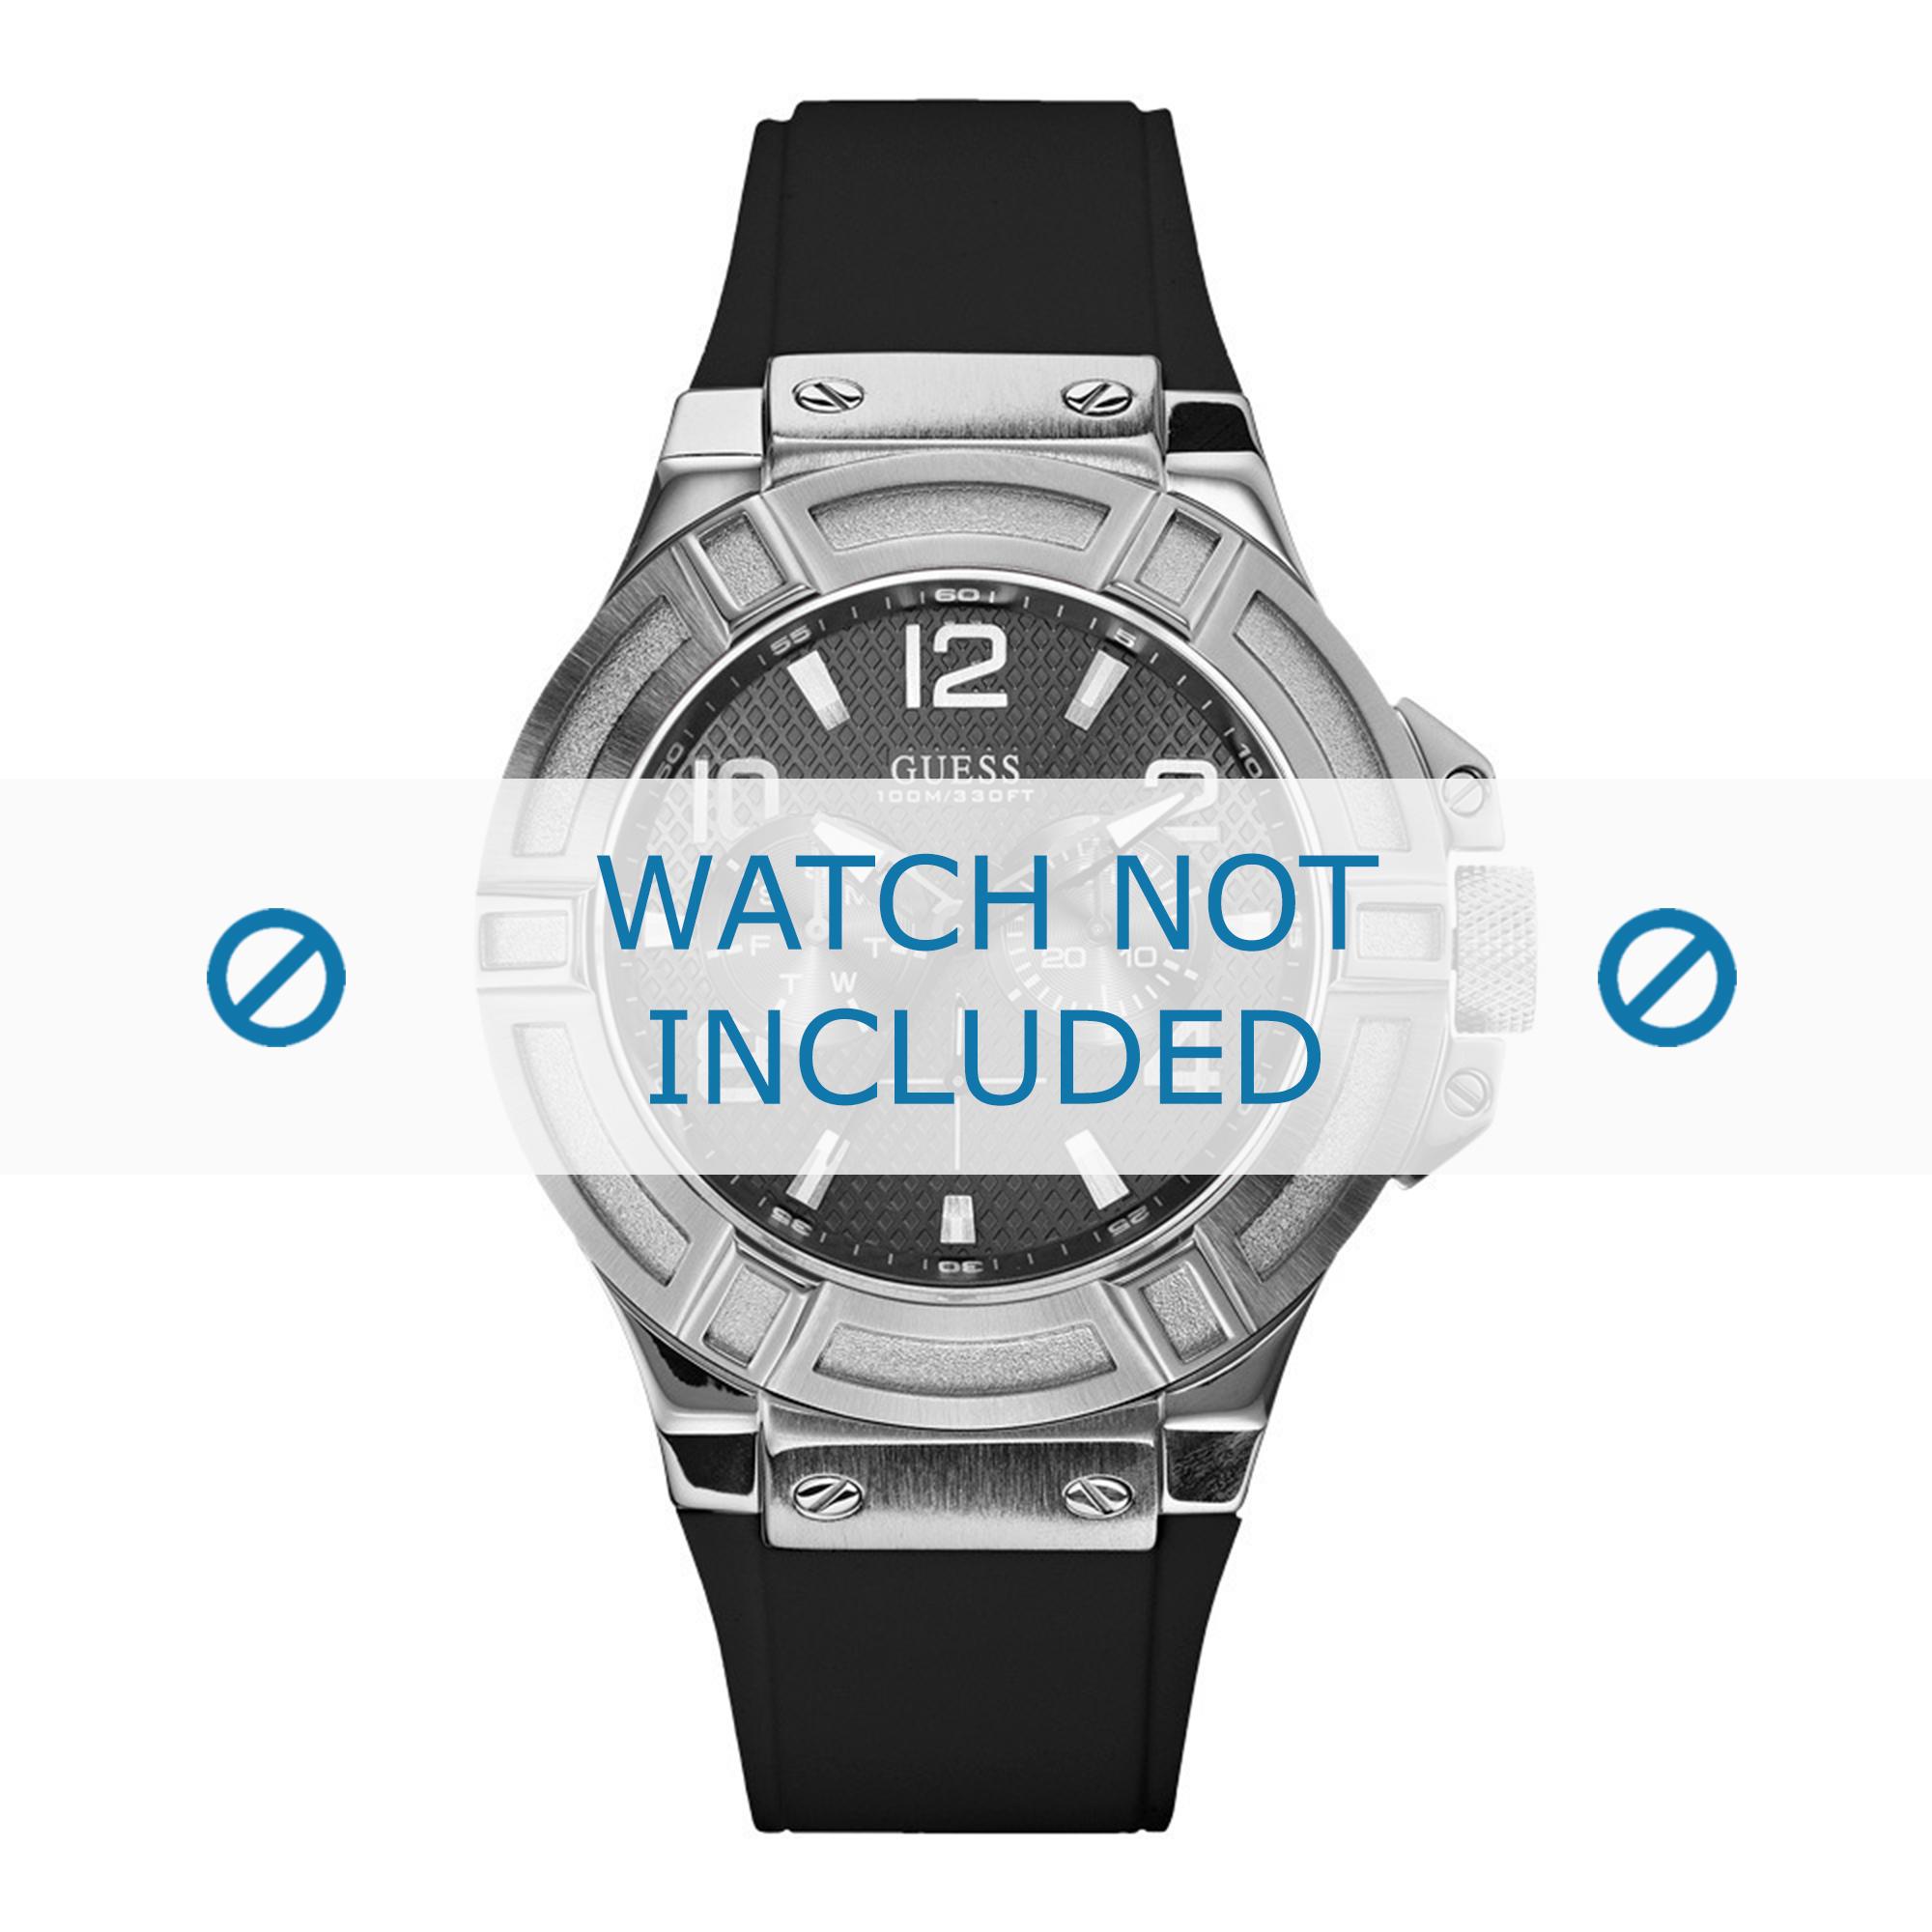 Guess horlogeband W0247G4 / U0247G4 Silicoon Zwart 22mm